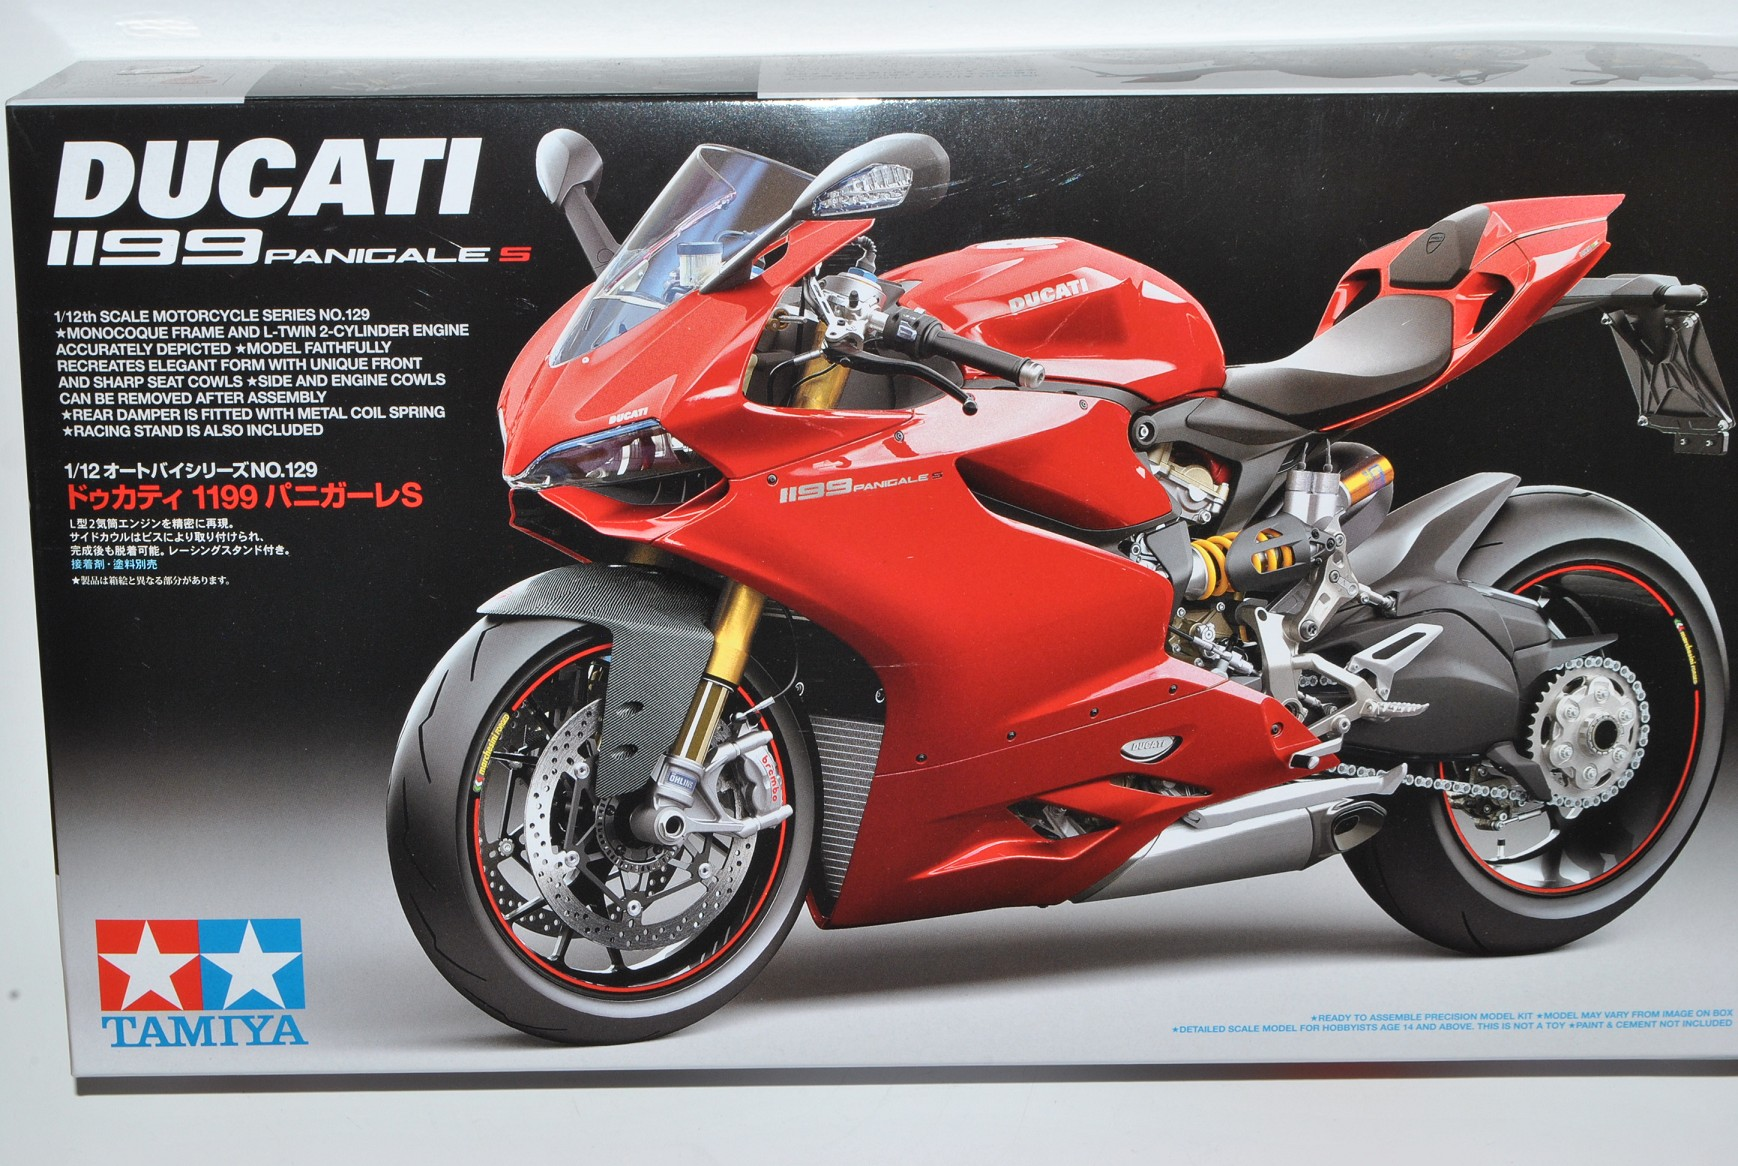 Ducati 1199 Panigale S red 14129 Kit Bausatz 1 1 1 12 Tamiya Modell Motorrad mit o.. d03820